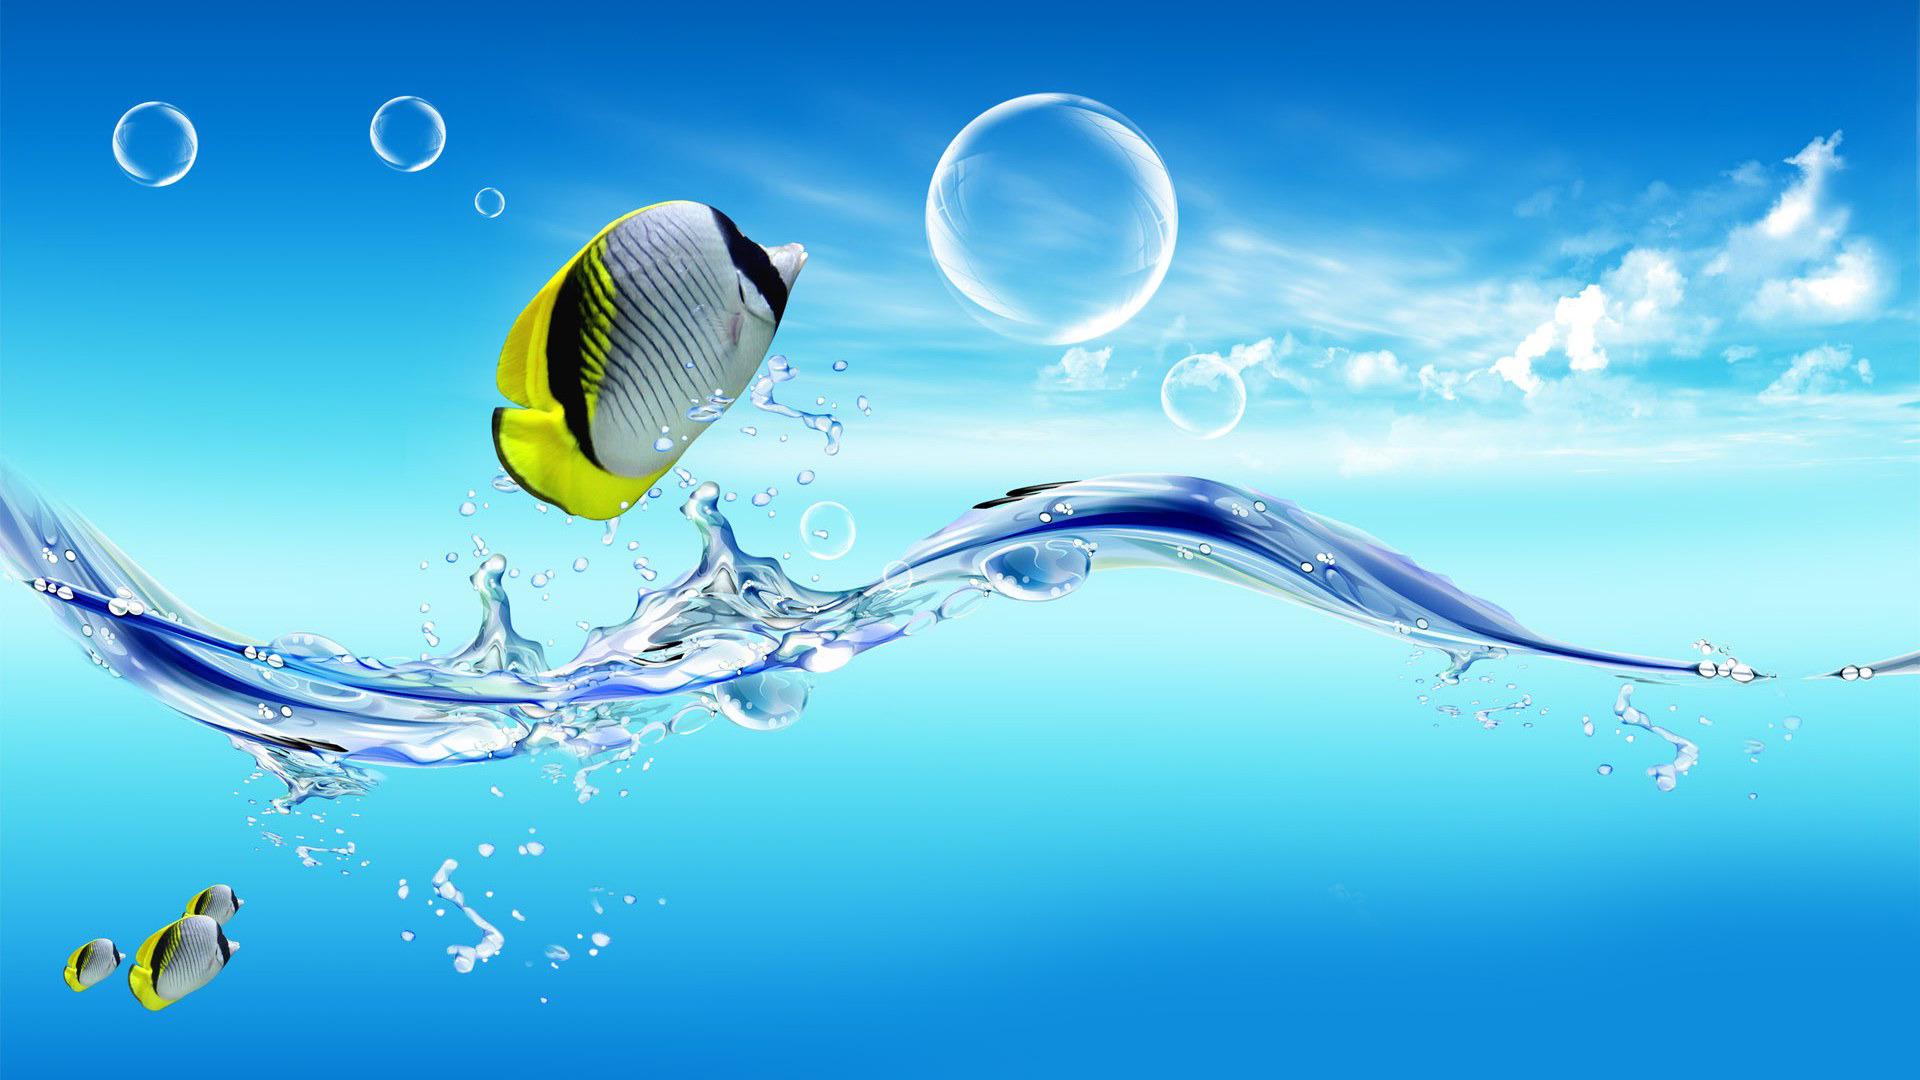 Water Fish Wallpaper Hd 4k Wallpaper For Pc Windows 10 1858424 Hd Wallpaper Backgrounds Download